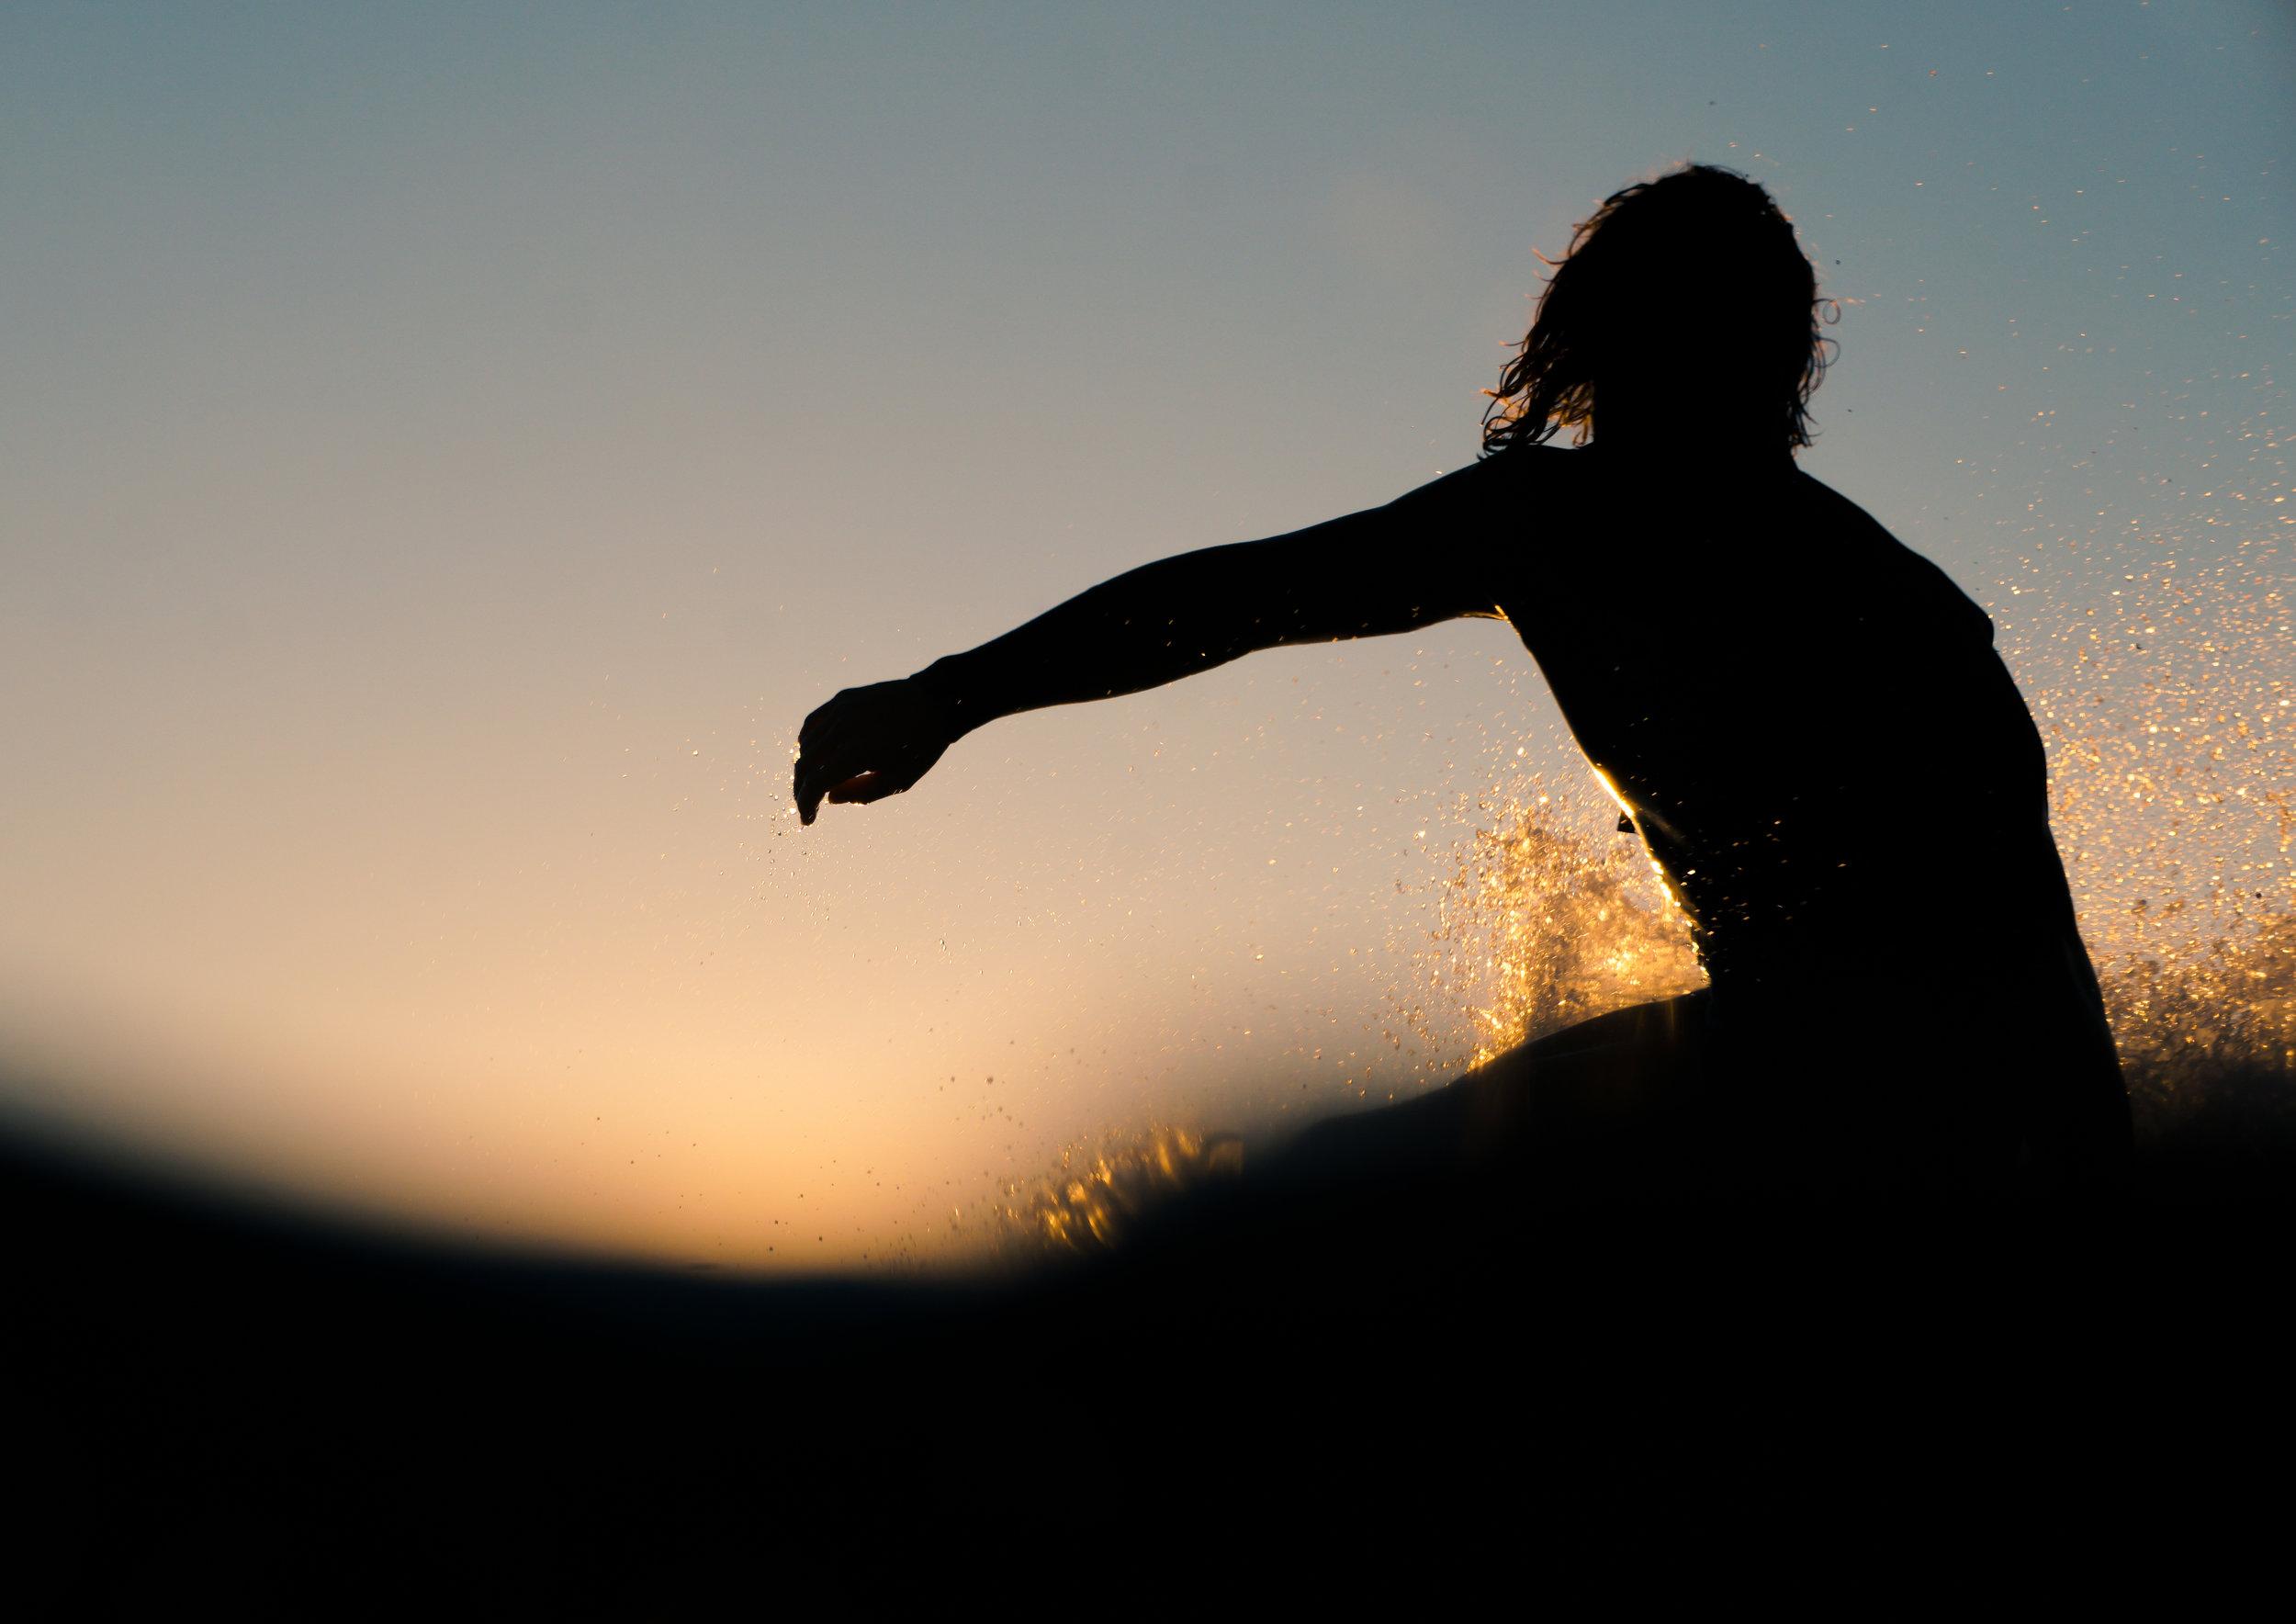 sunrise silhouette -1.jpg